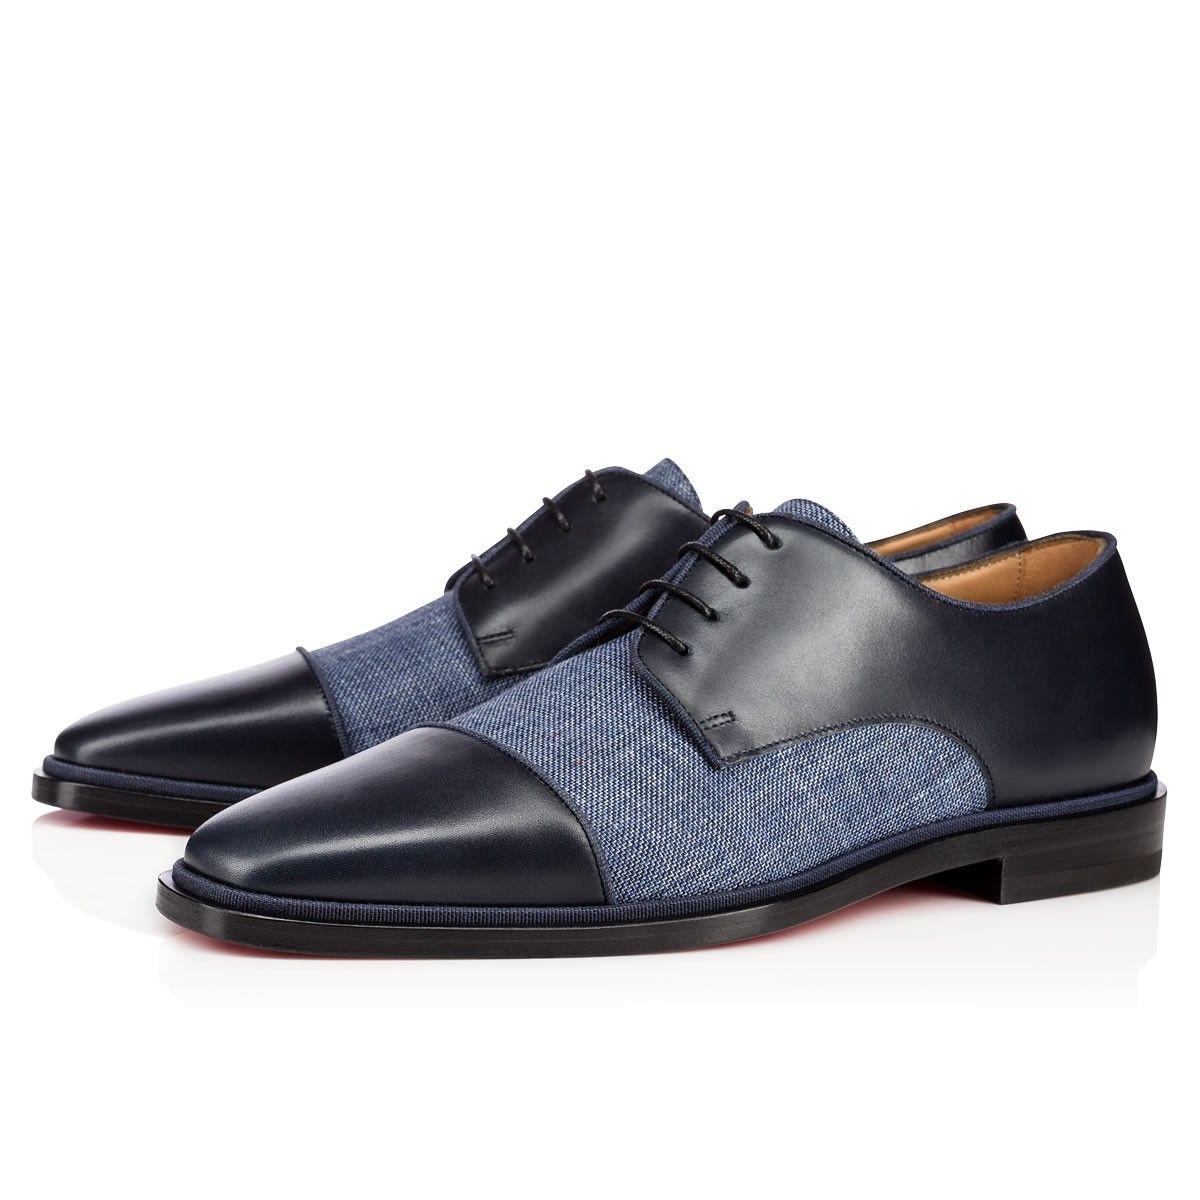 Christian louboutin · CHRISTIAN LOUBOUTIN Bruno Orlato Flat Version Navy  Leather.